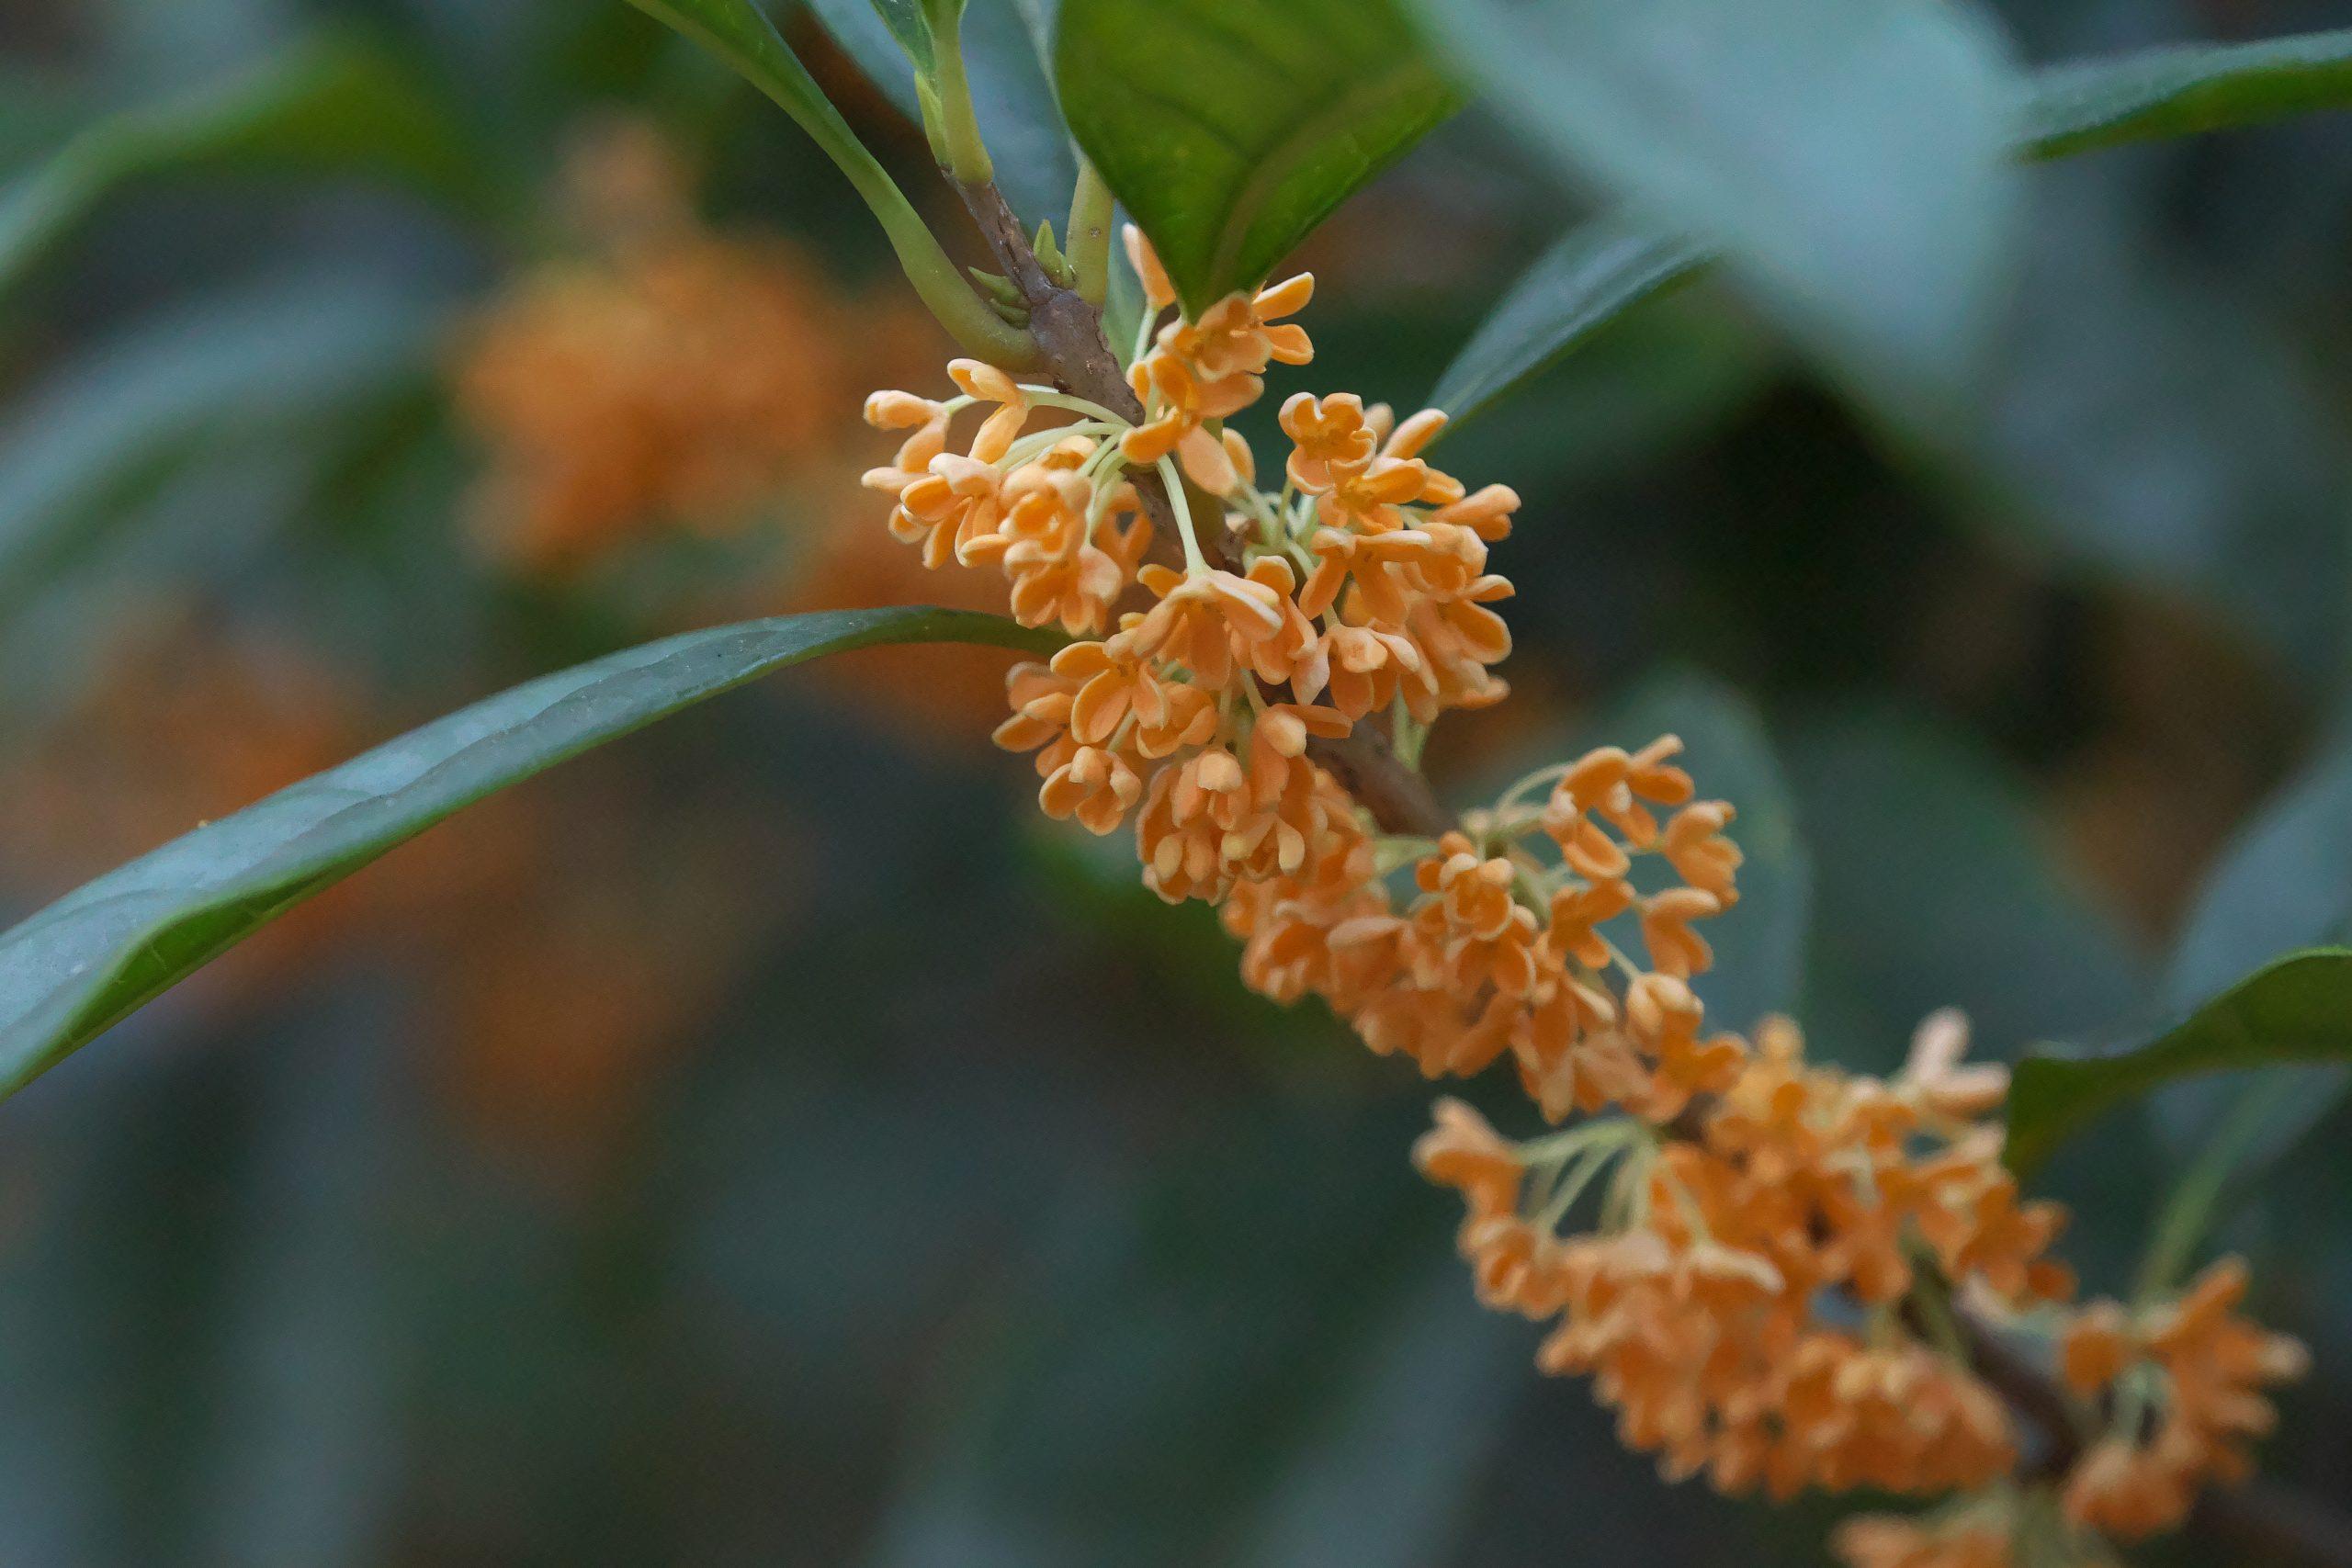 【SONY】この季節に咲く花(10)